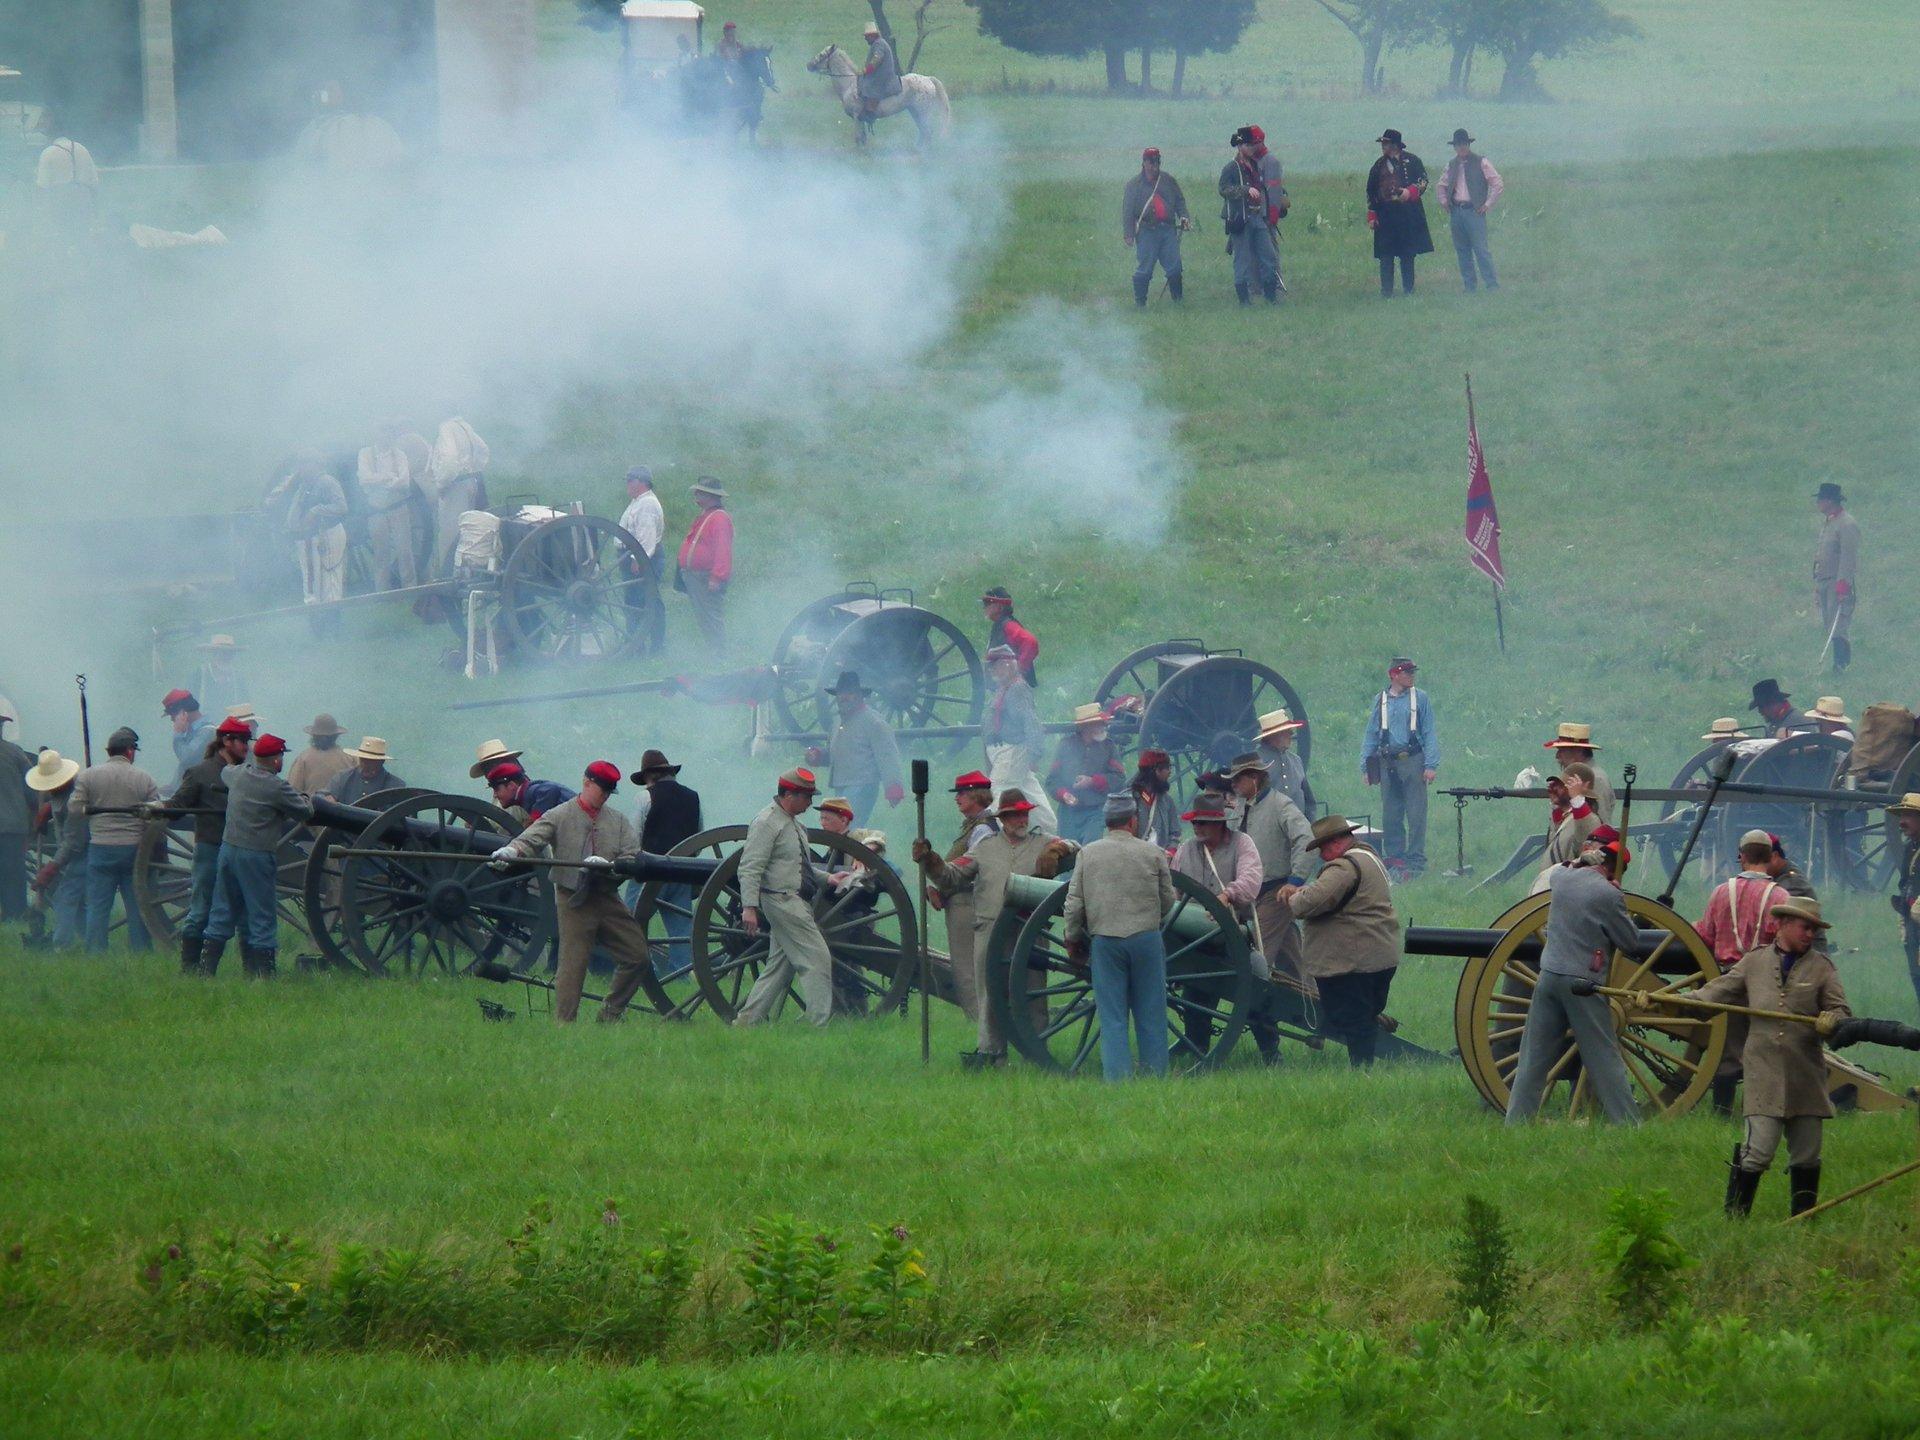 Best time to see Gettysburg Civil War Battle Reenactment in Pennsylvania 2020